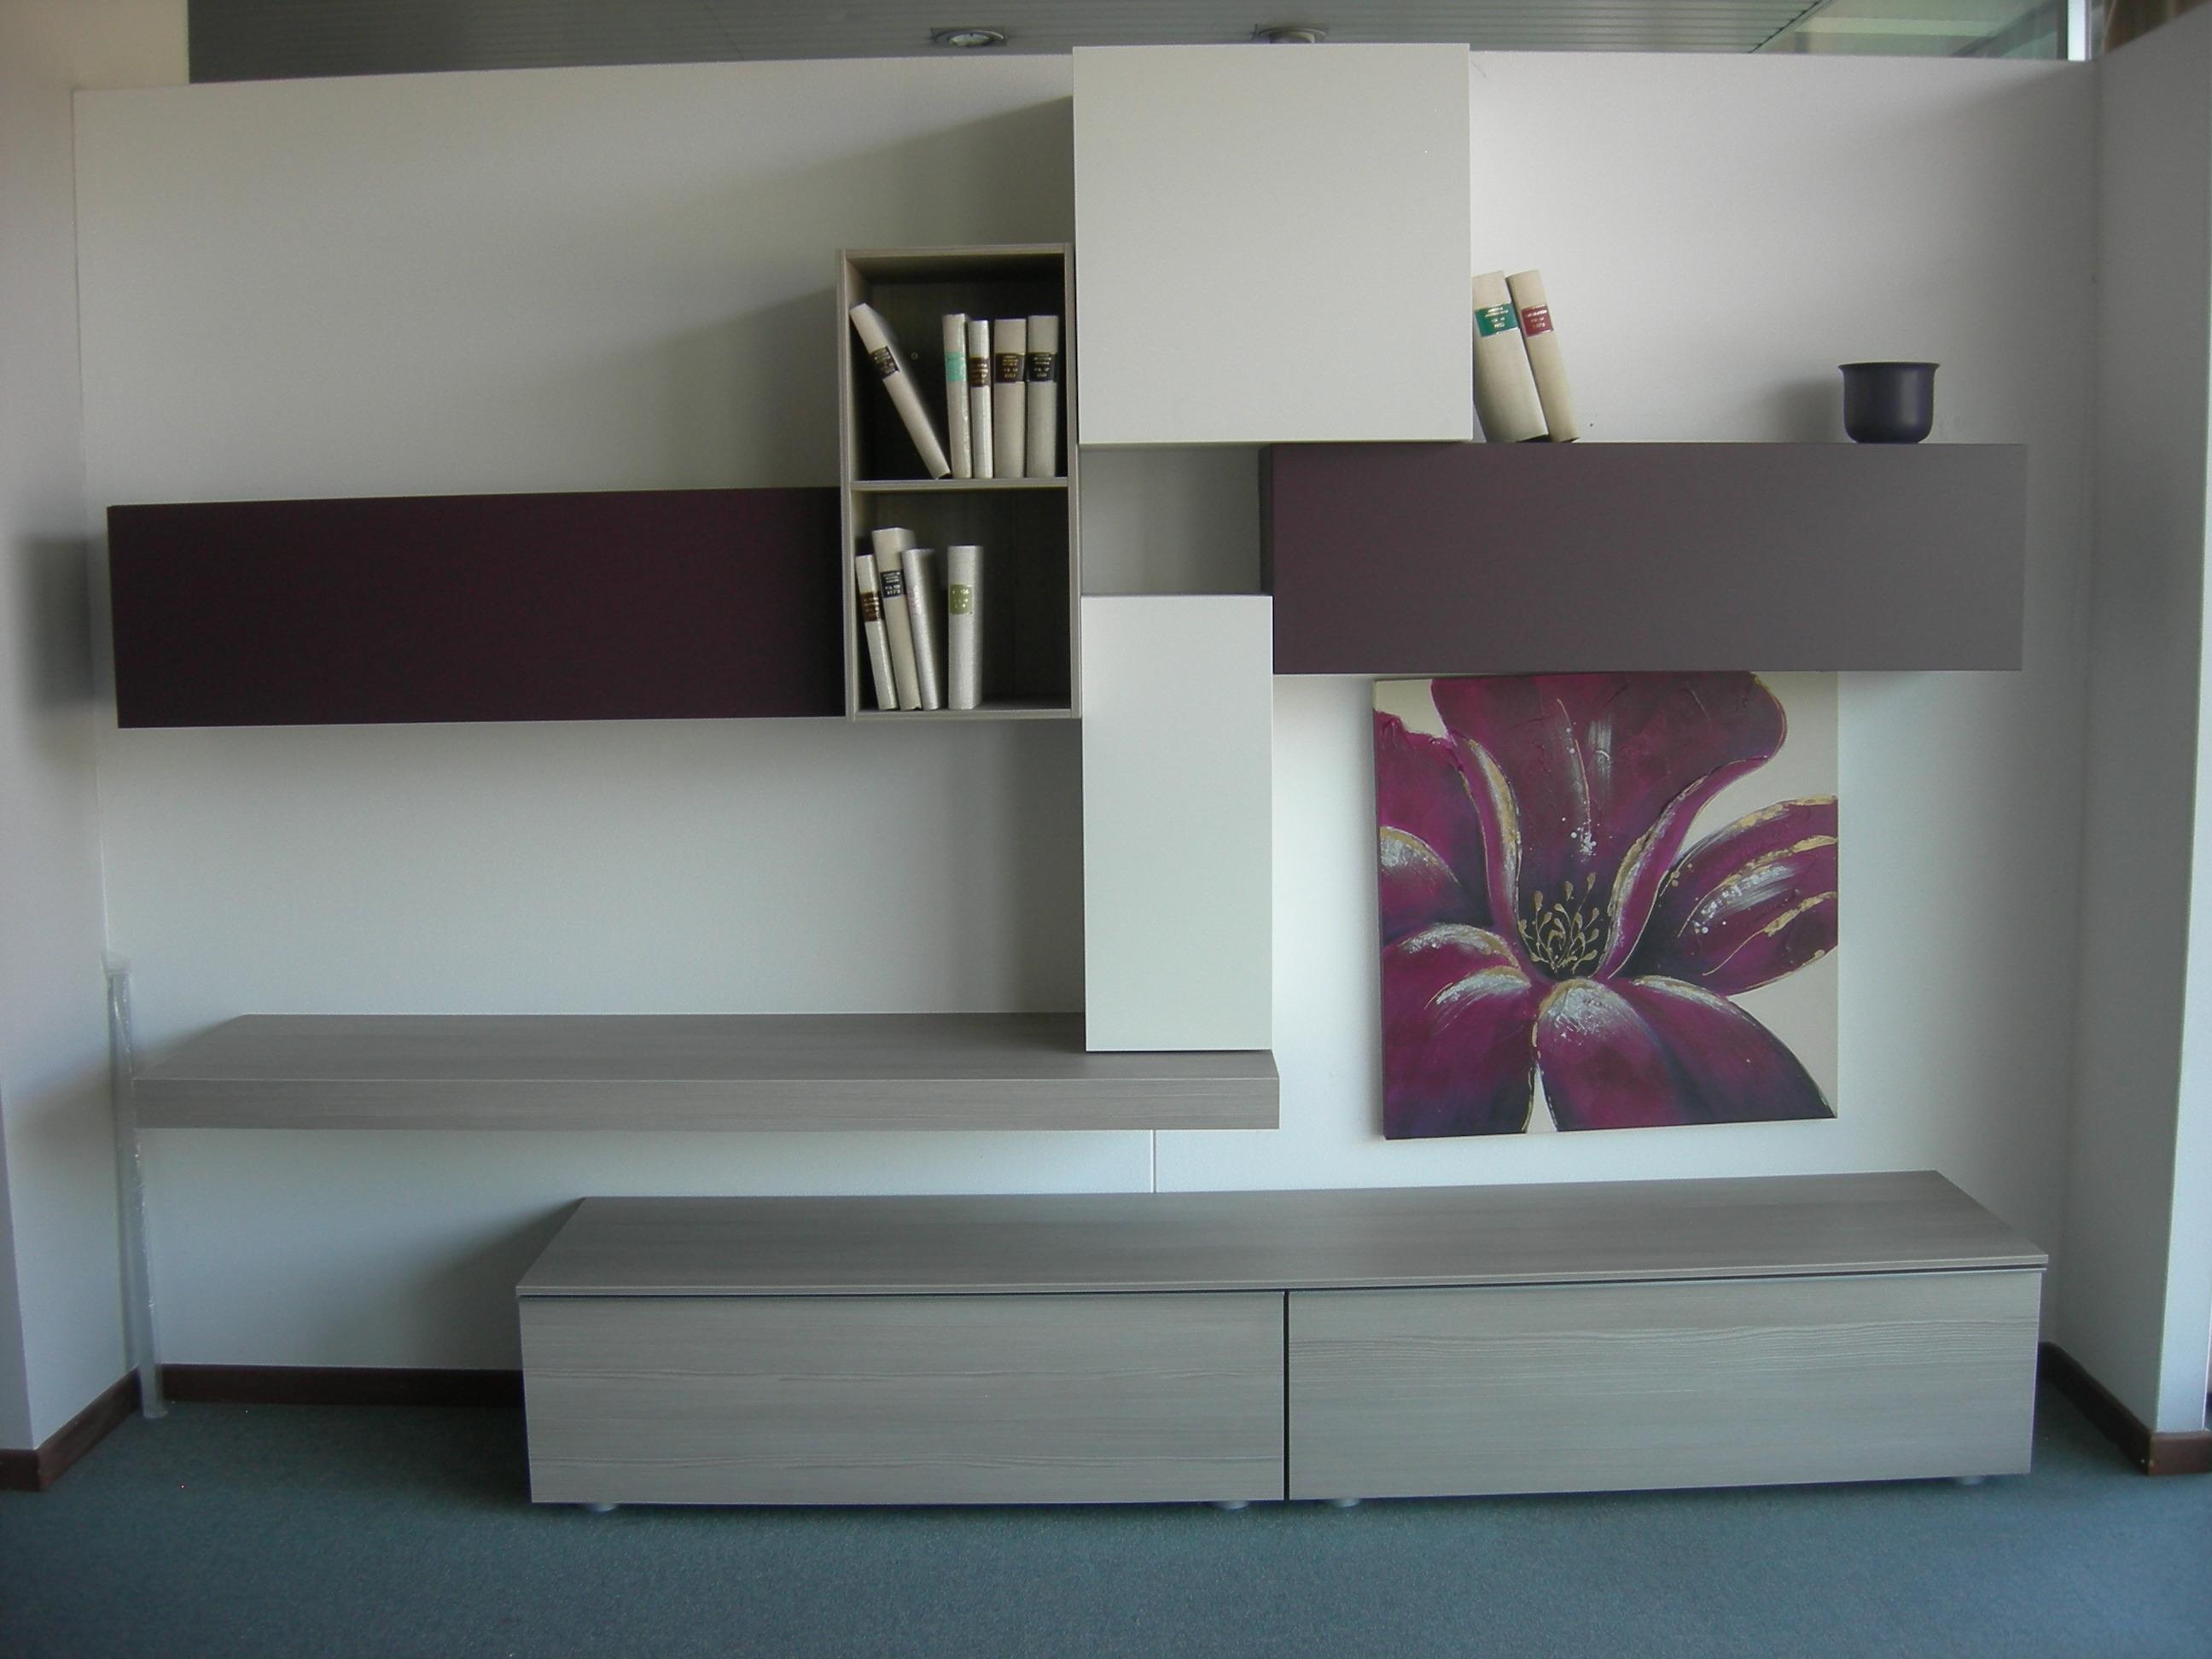 Beautiful Imab Group Opinioni Images - Home Design Ideas 2017 ...